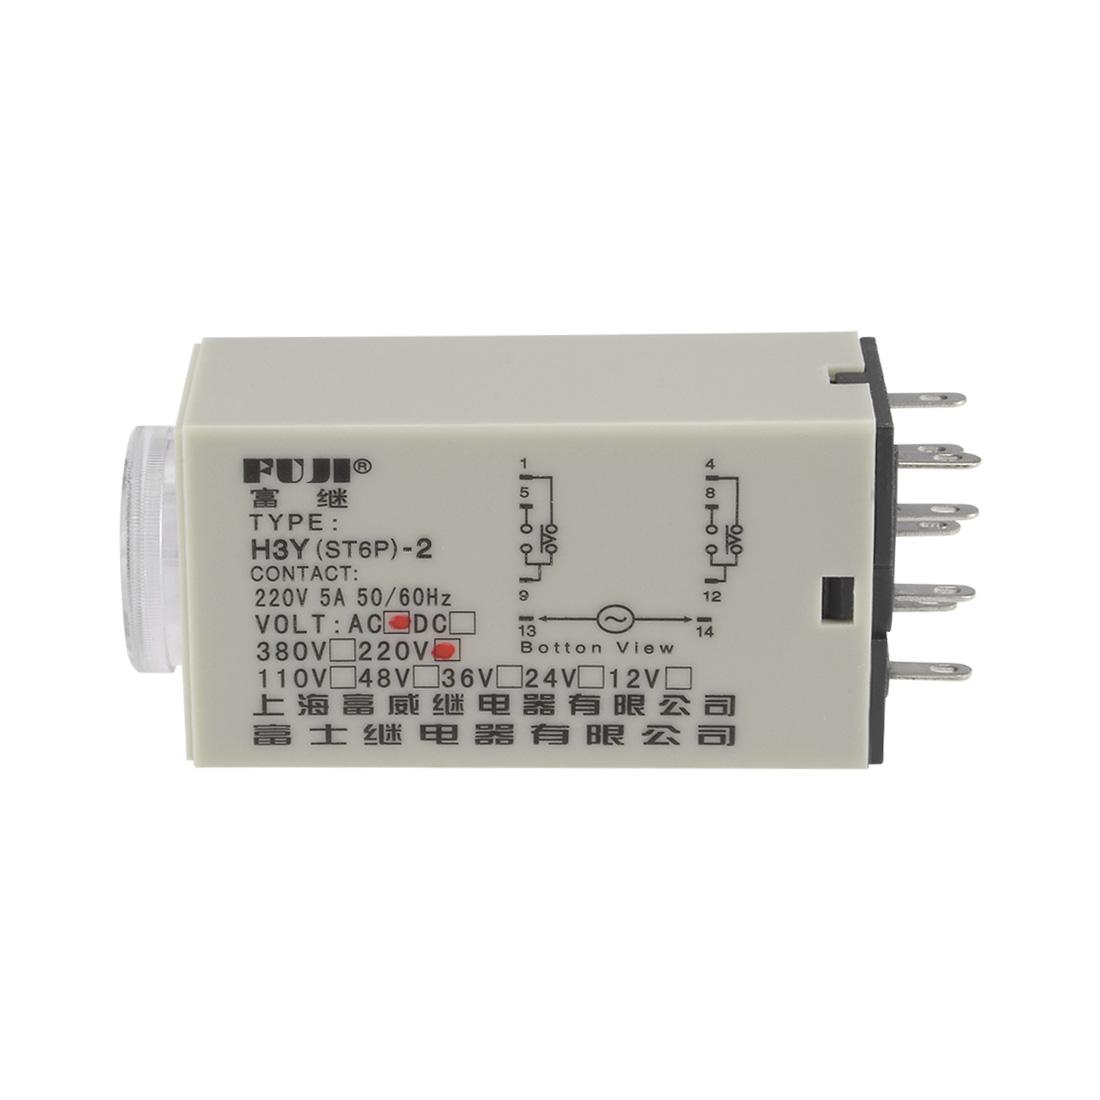 220VAC 60S 8 Terminals Range Adjustable Delay Timer Time Relay H3Y-2 w base - image 2 of 6